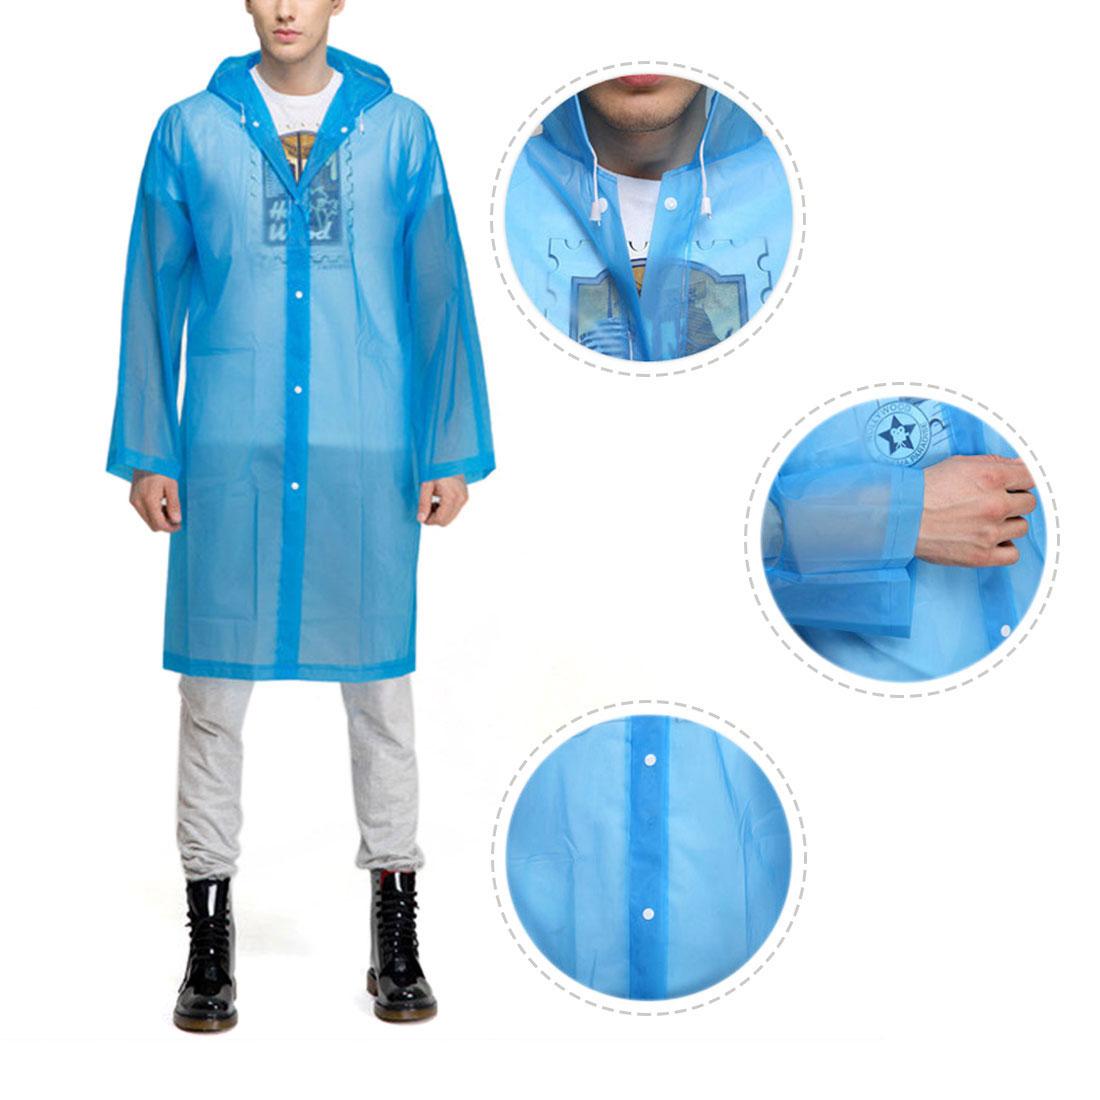 Blue EVA Outdoor Waterproof Raincoat Rainwear Hooded Rain Poncho for Bicycle